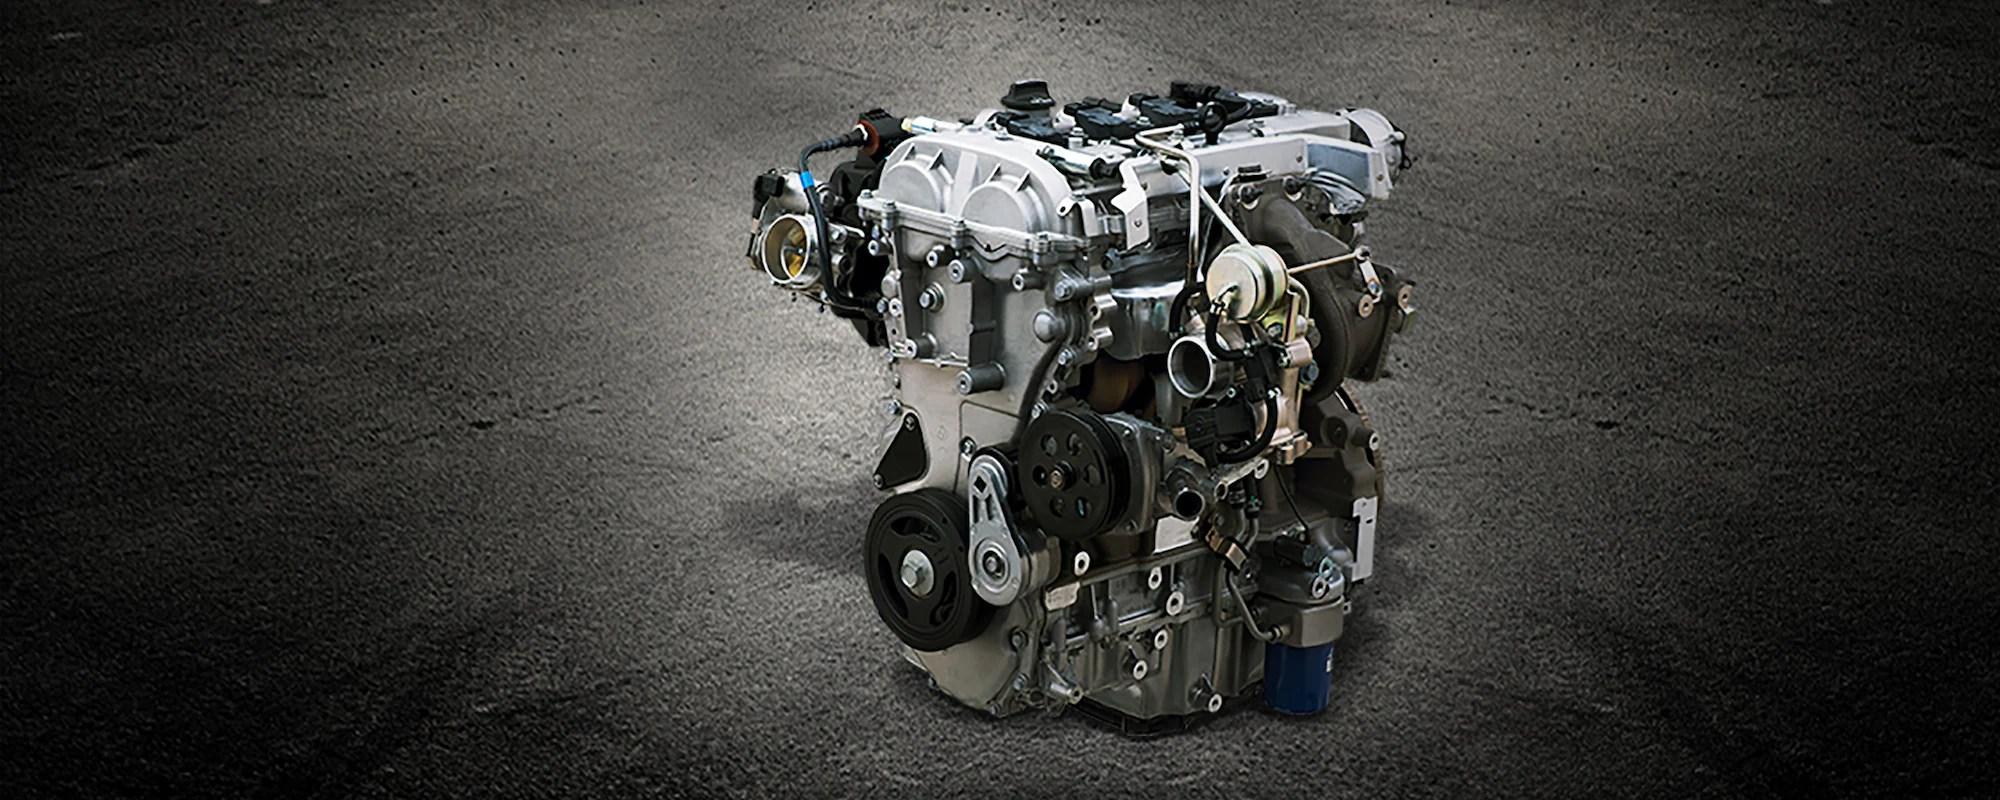 hight resolution of rear engine diagram 3800 v6 engine